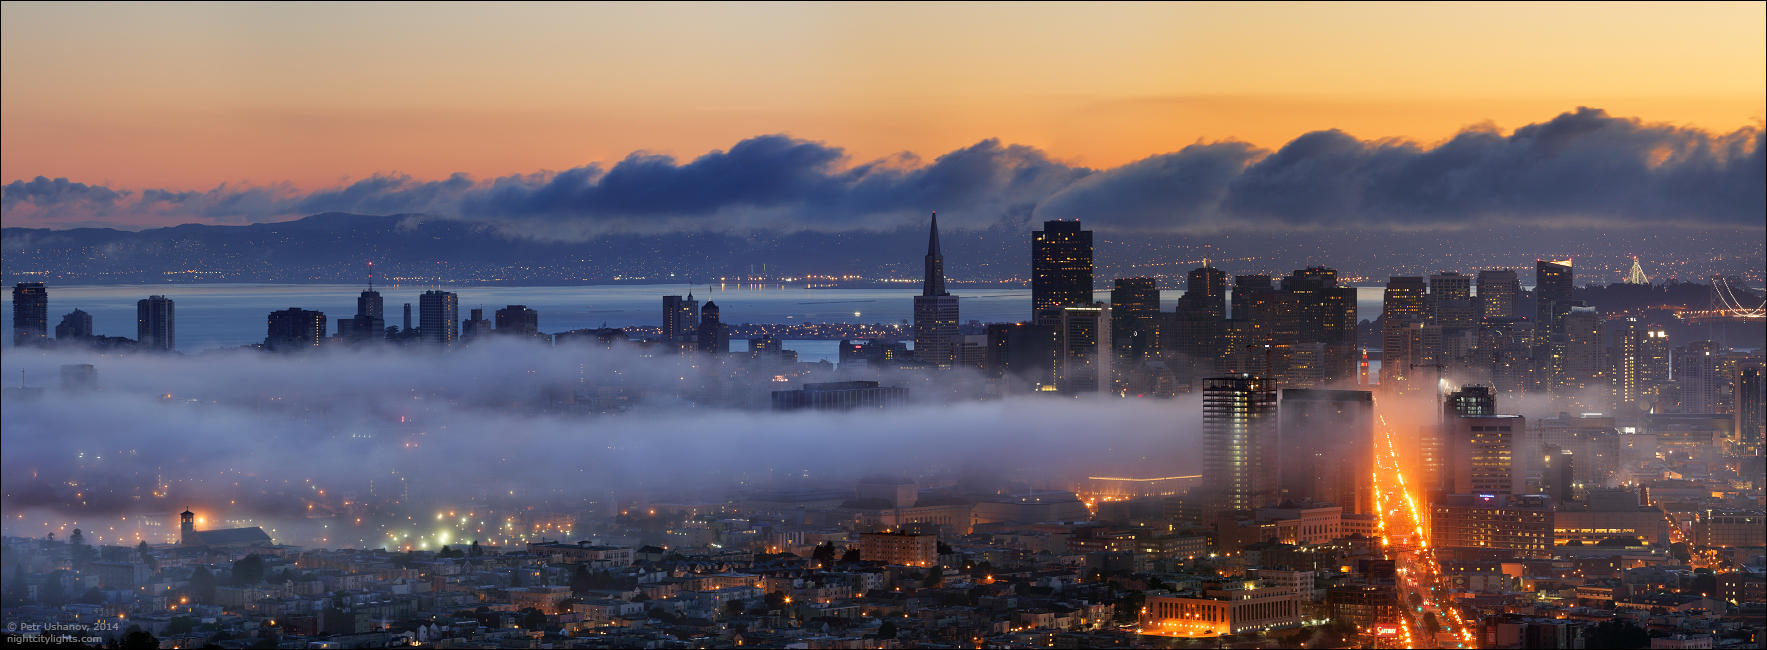 SFpanorama08 Сан Франциско   панорамы города